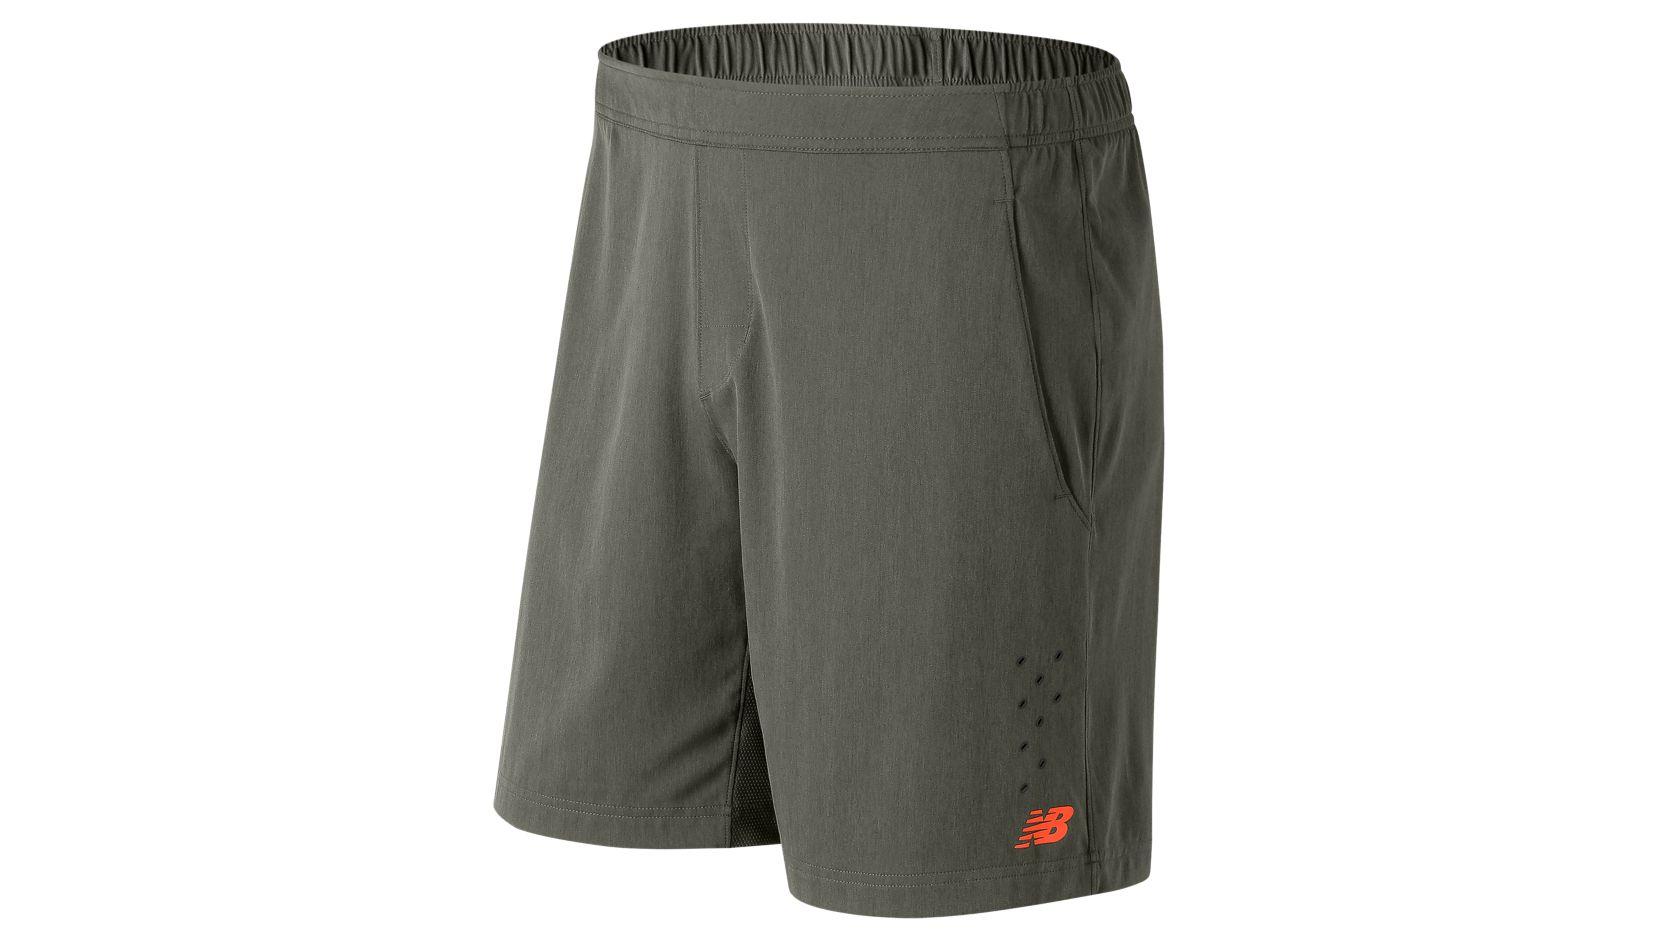 New Balance Tournament 9 Inch Shorts - £50.00